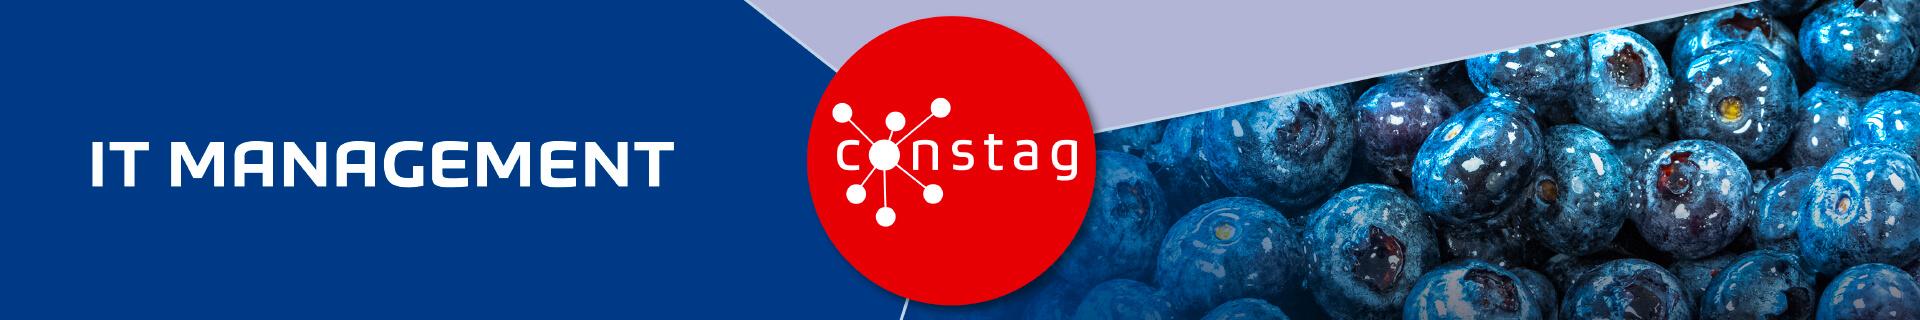 Constag Produkte IT Management Neutral